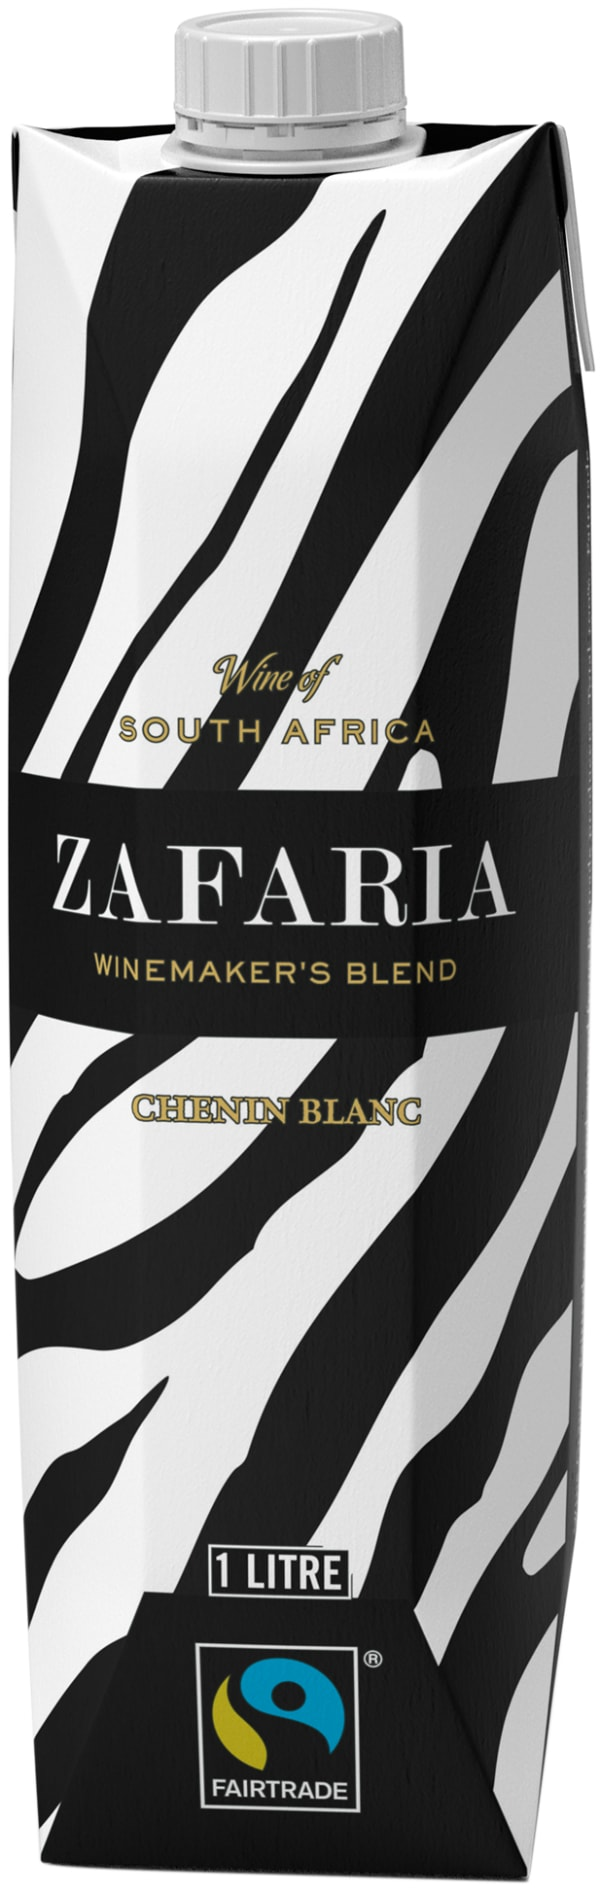 Zafaria Winemakers Blend Chenin Blanc 2020 kartongförpackning